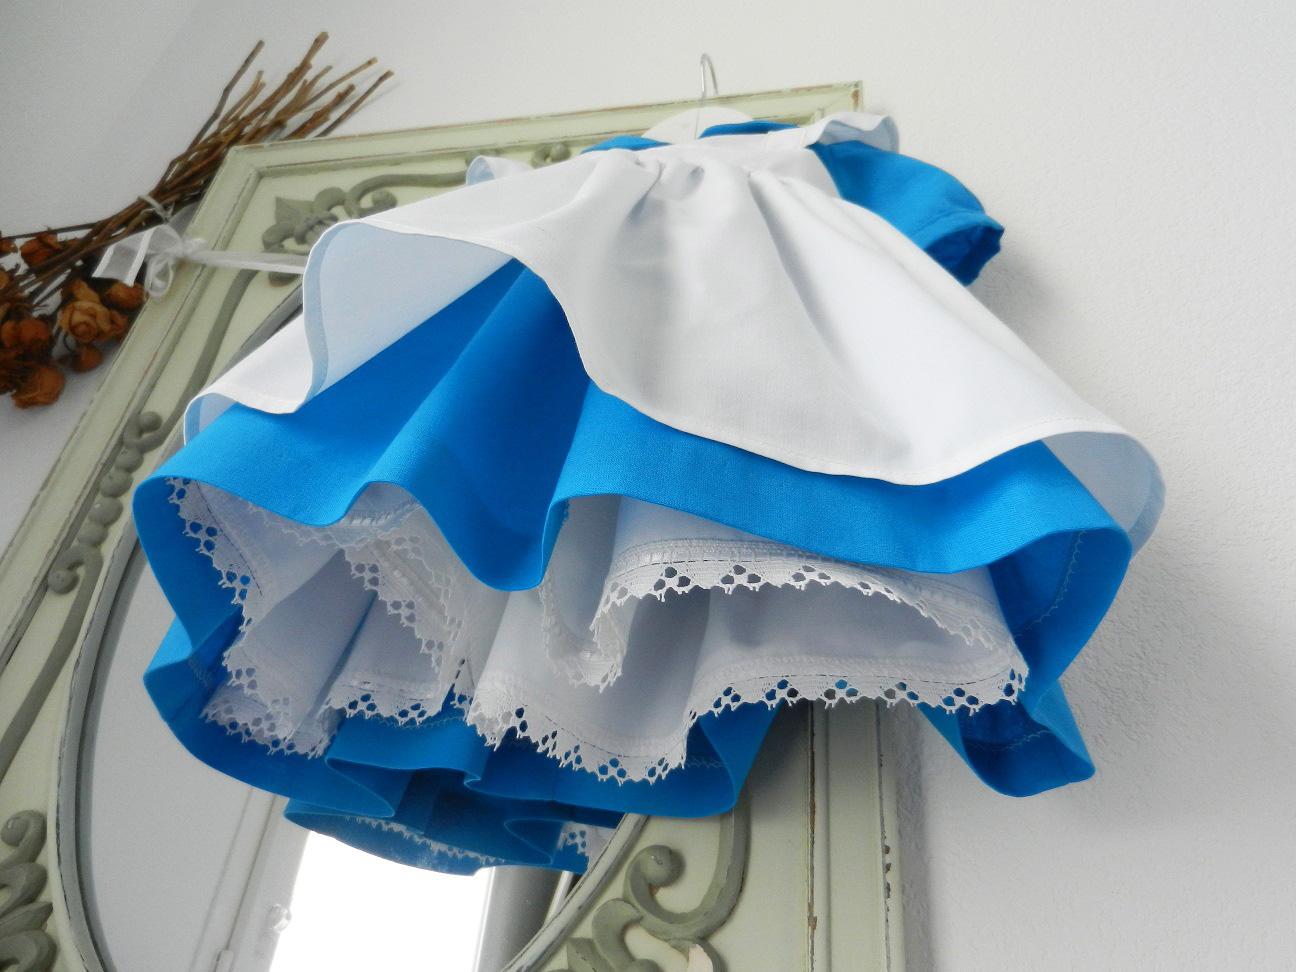 Duchesse or ange 190 robe bleue alice tablier blanc jupon blue dress white apron petticoat g